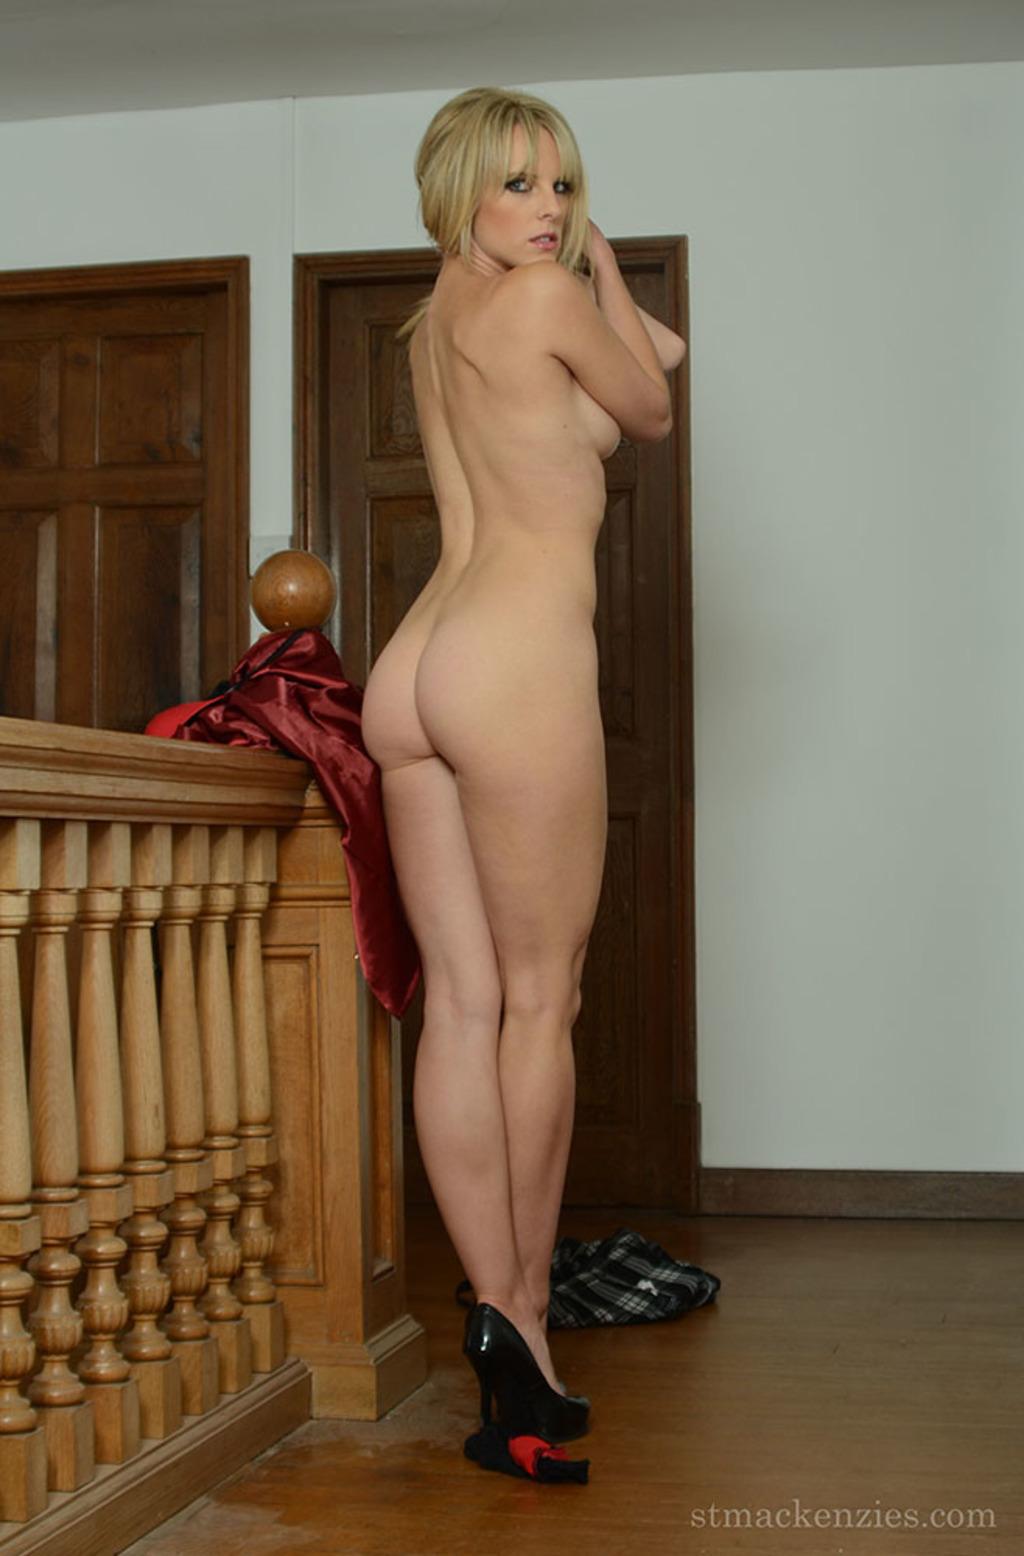 alastair-mackenzie-naked-hot-sexy-girls-nude-pussy